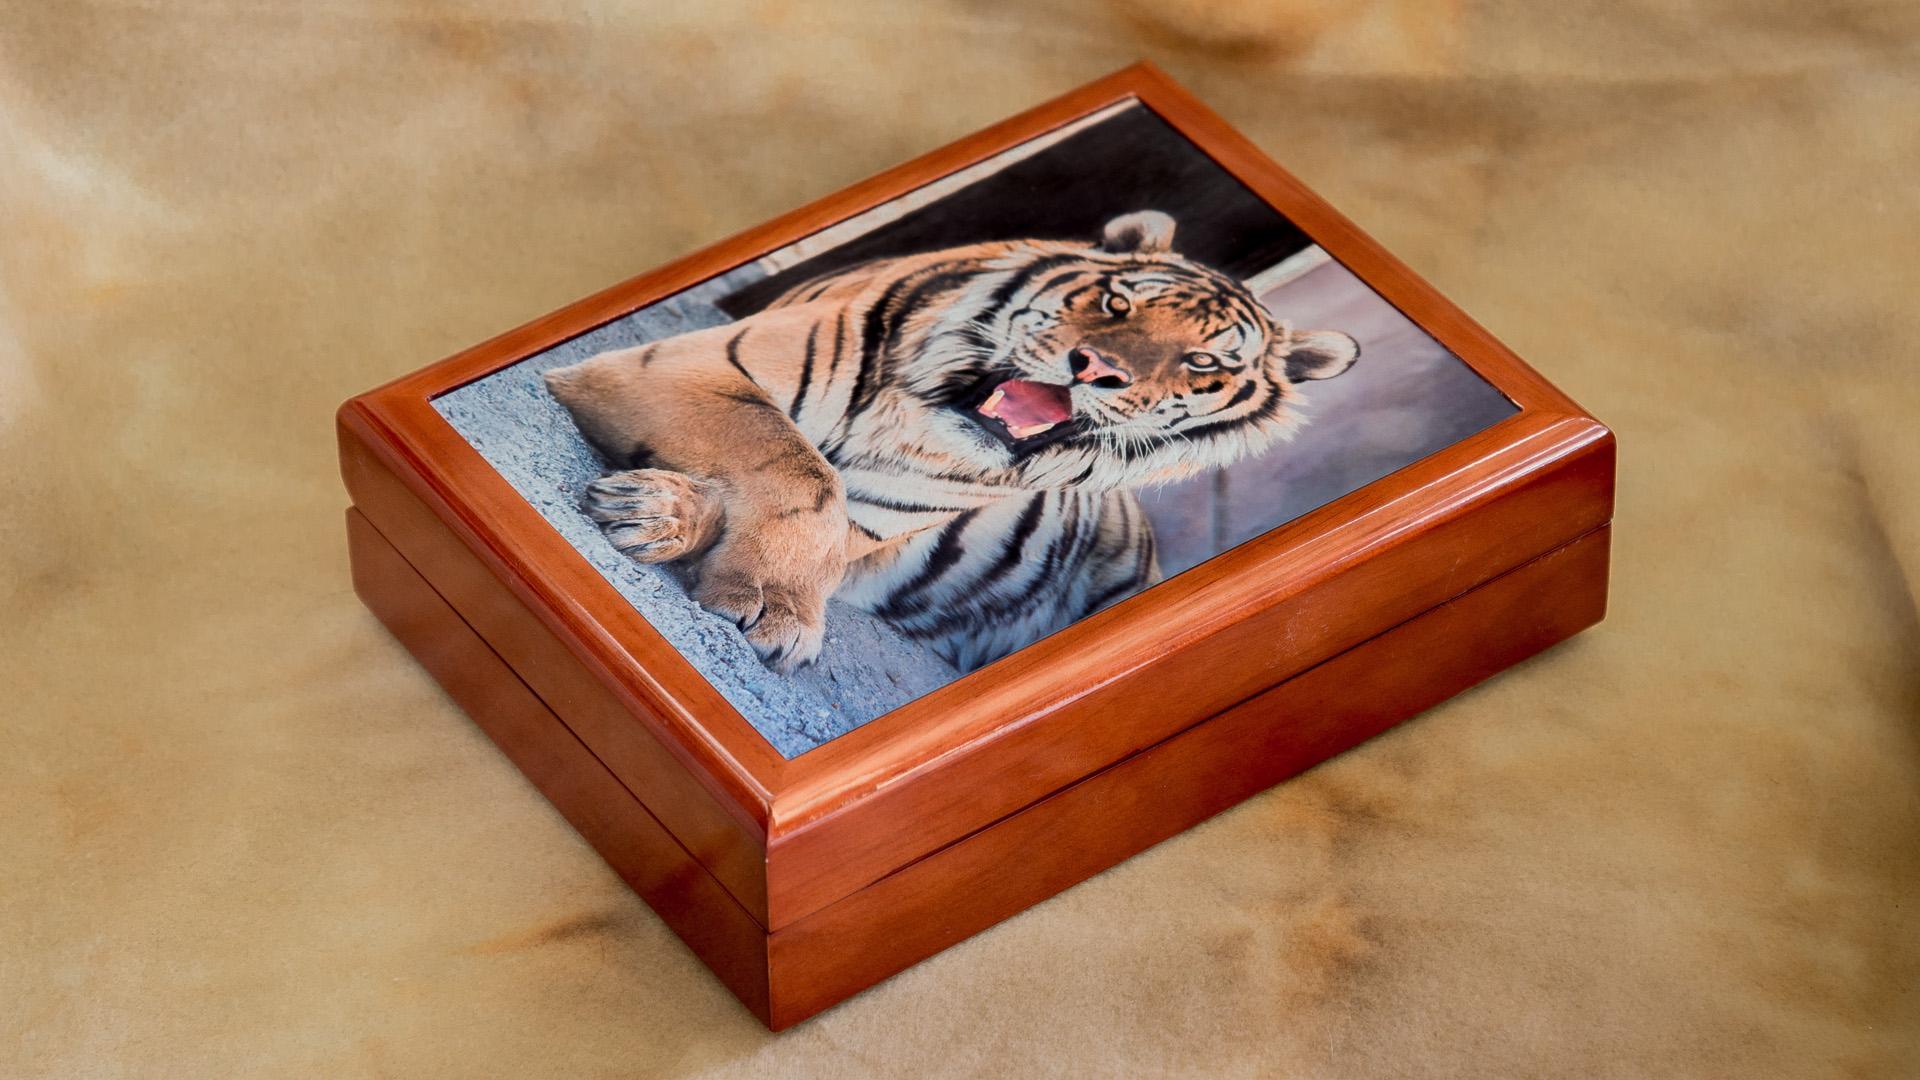 Keepsake_box_cultured_tiger_diagonal_by_Terrence_Robertson-Fall-5.jpg